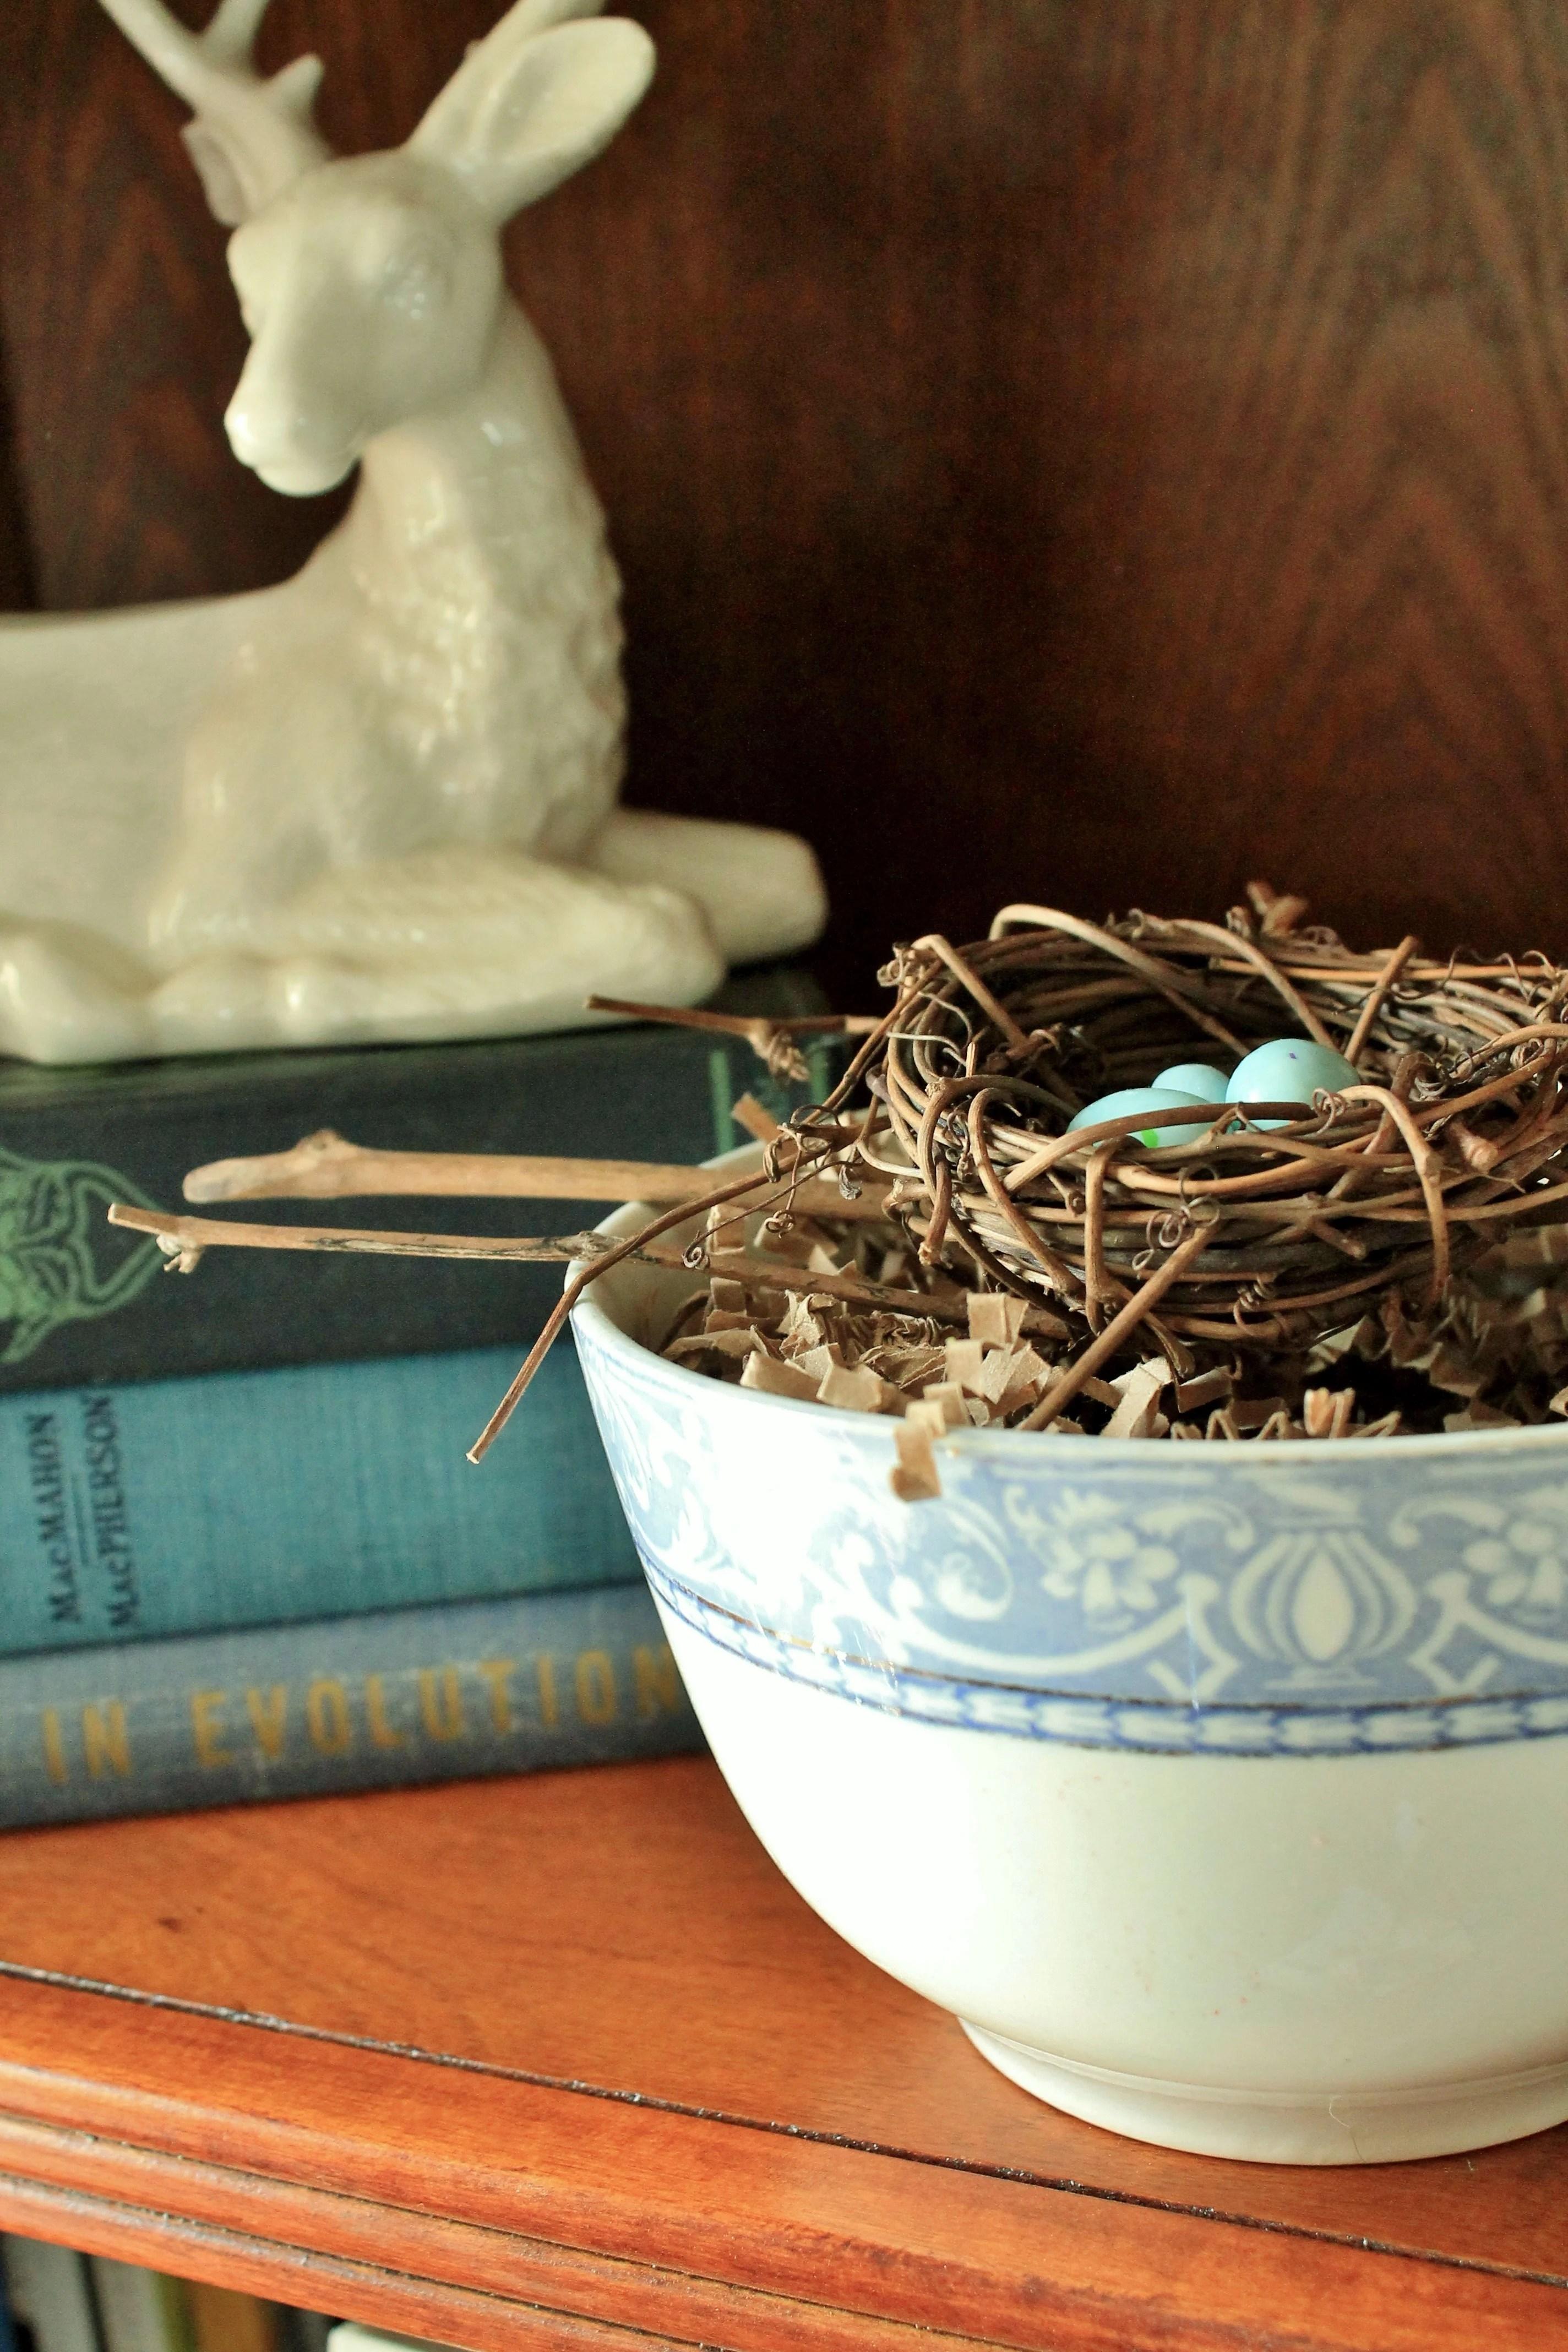 Vintage transferware bowl with nest